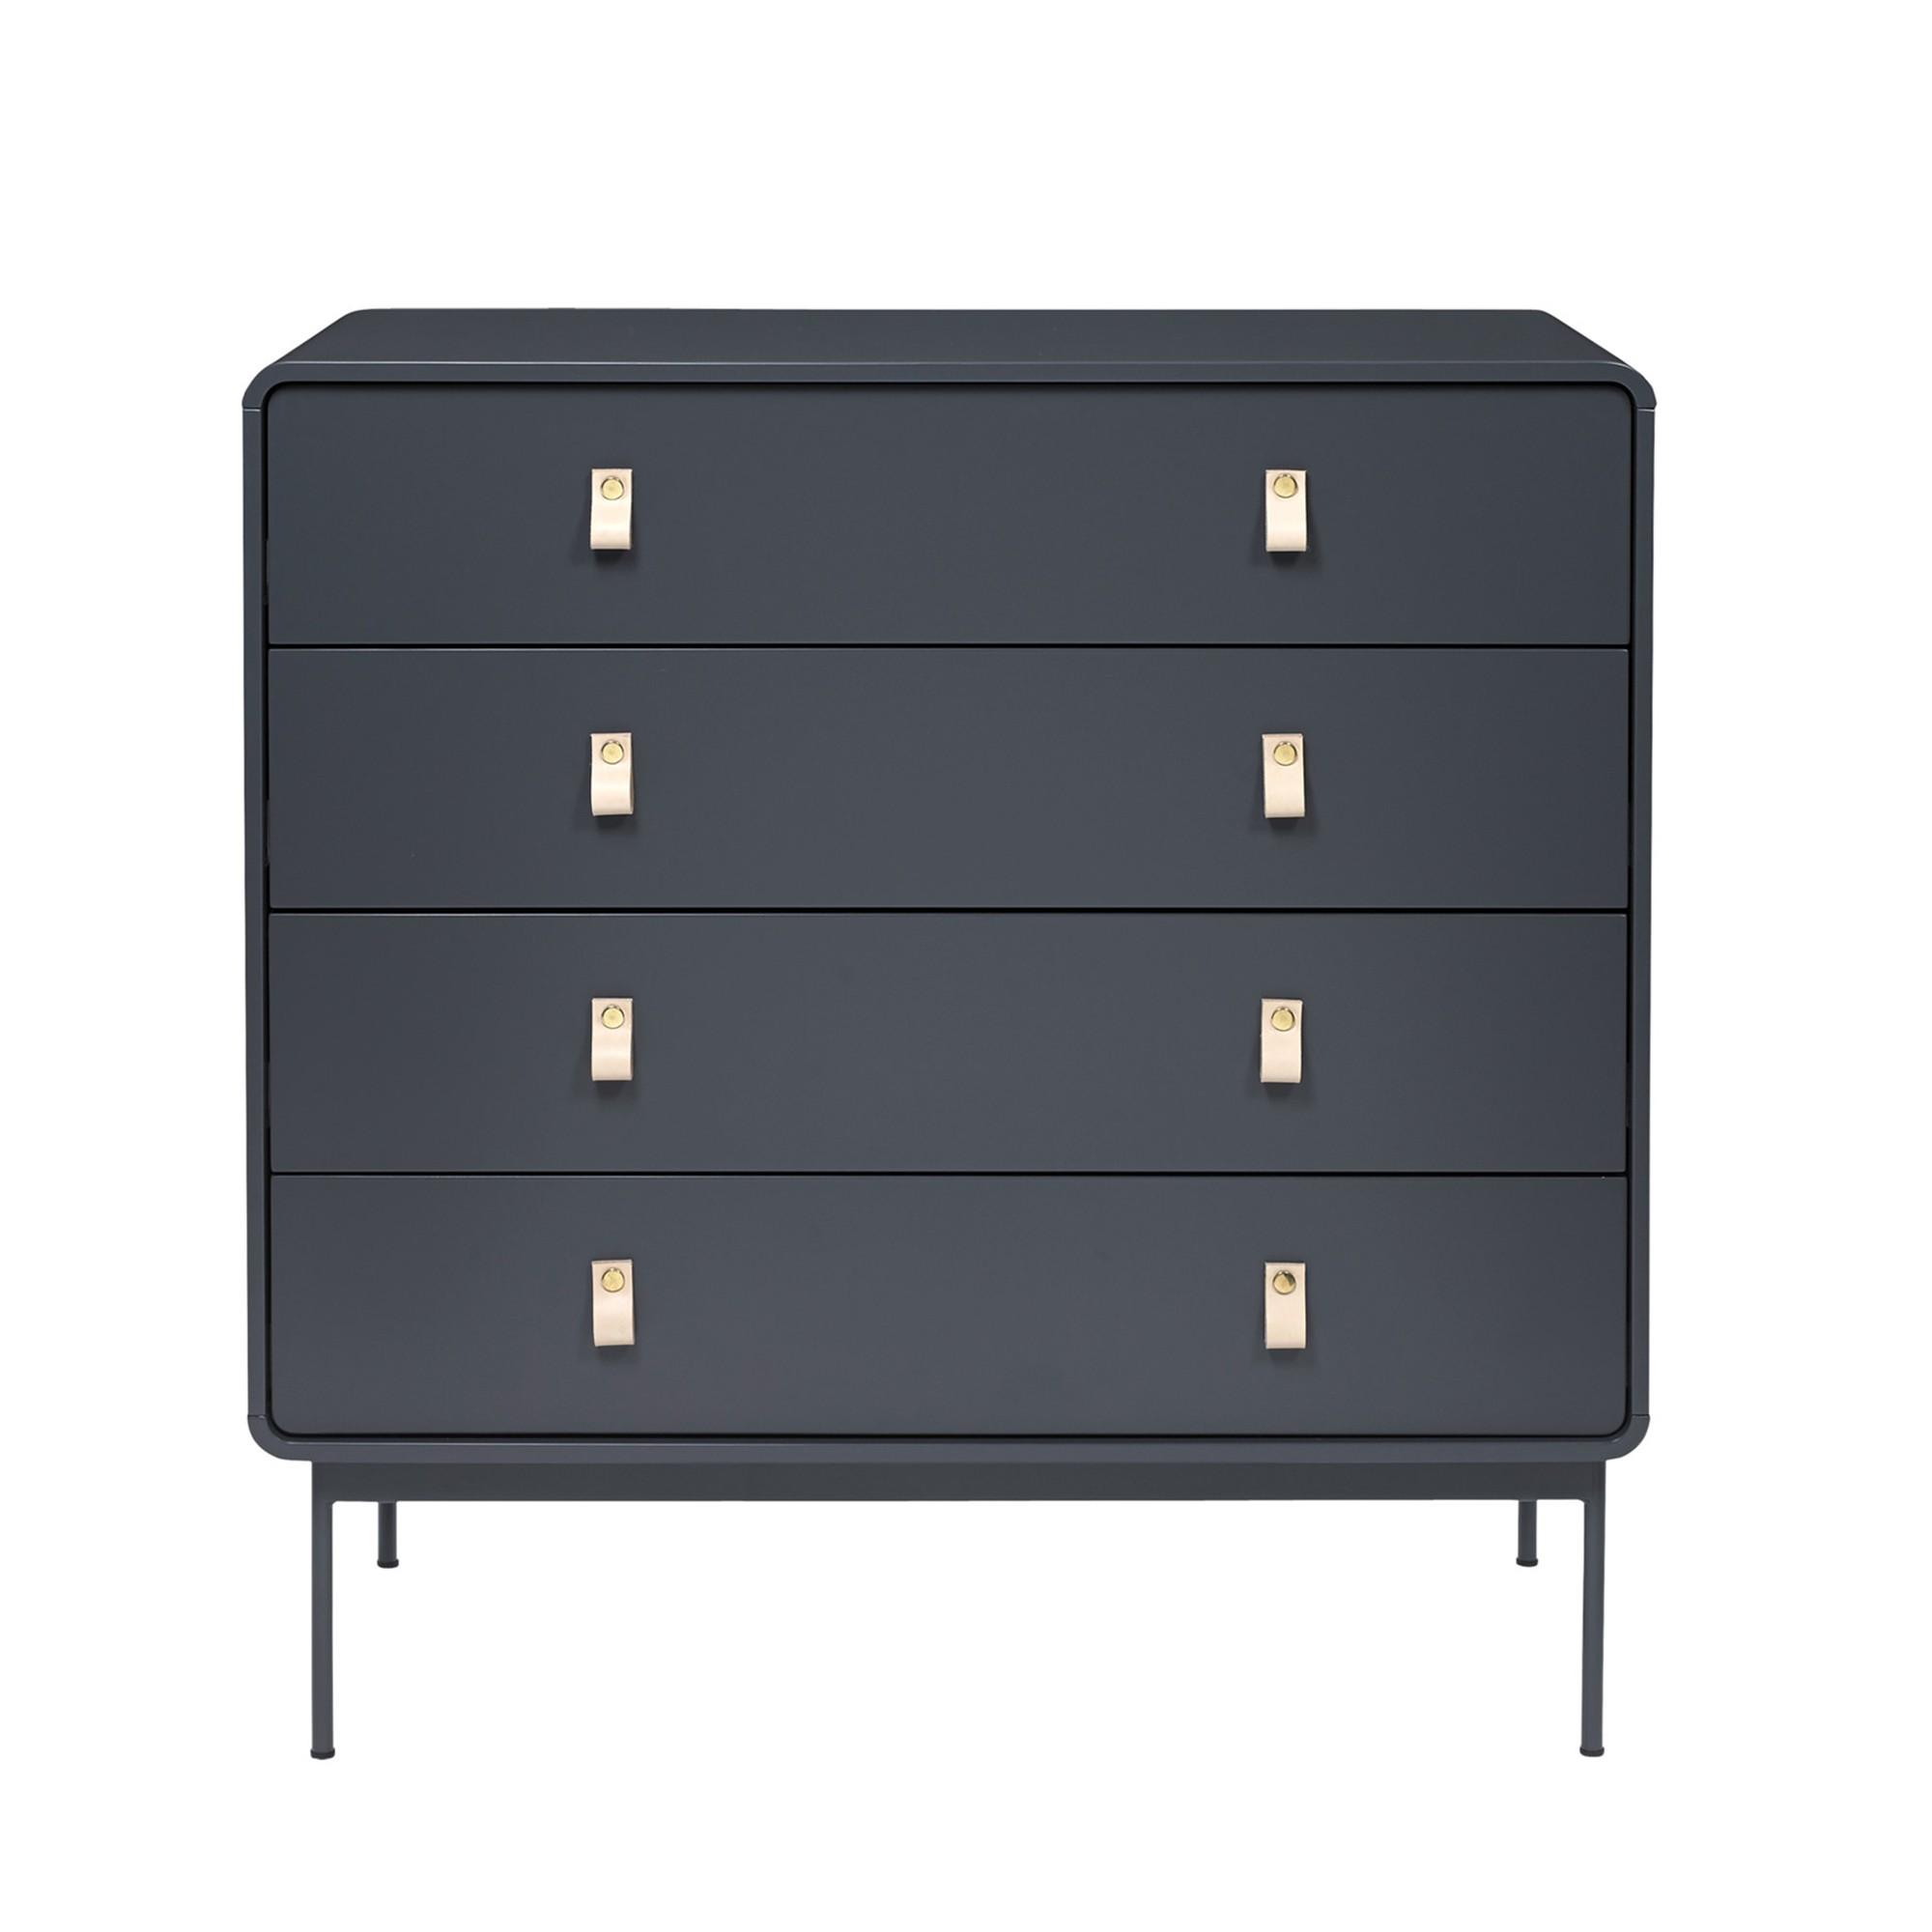 commode scandinave maison du monde commode scandinave maison du monde with commode scandinave. Black Bedroom Furniture Sets. Home Design Ideas